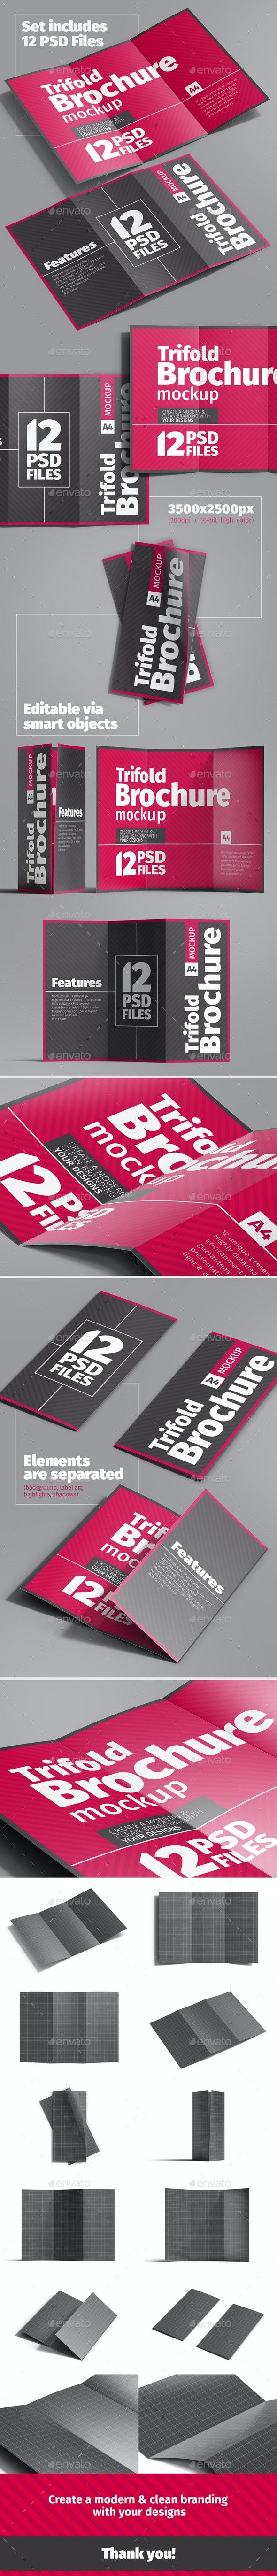 Trifold Brochure (A4) Mockup - Brochures Print